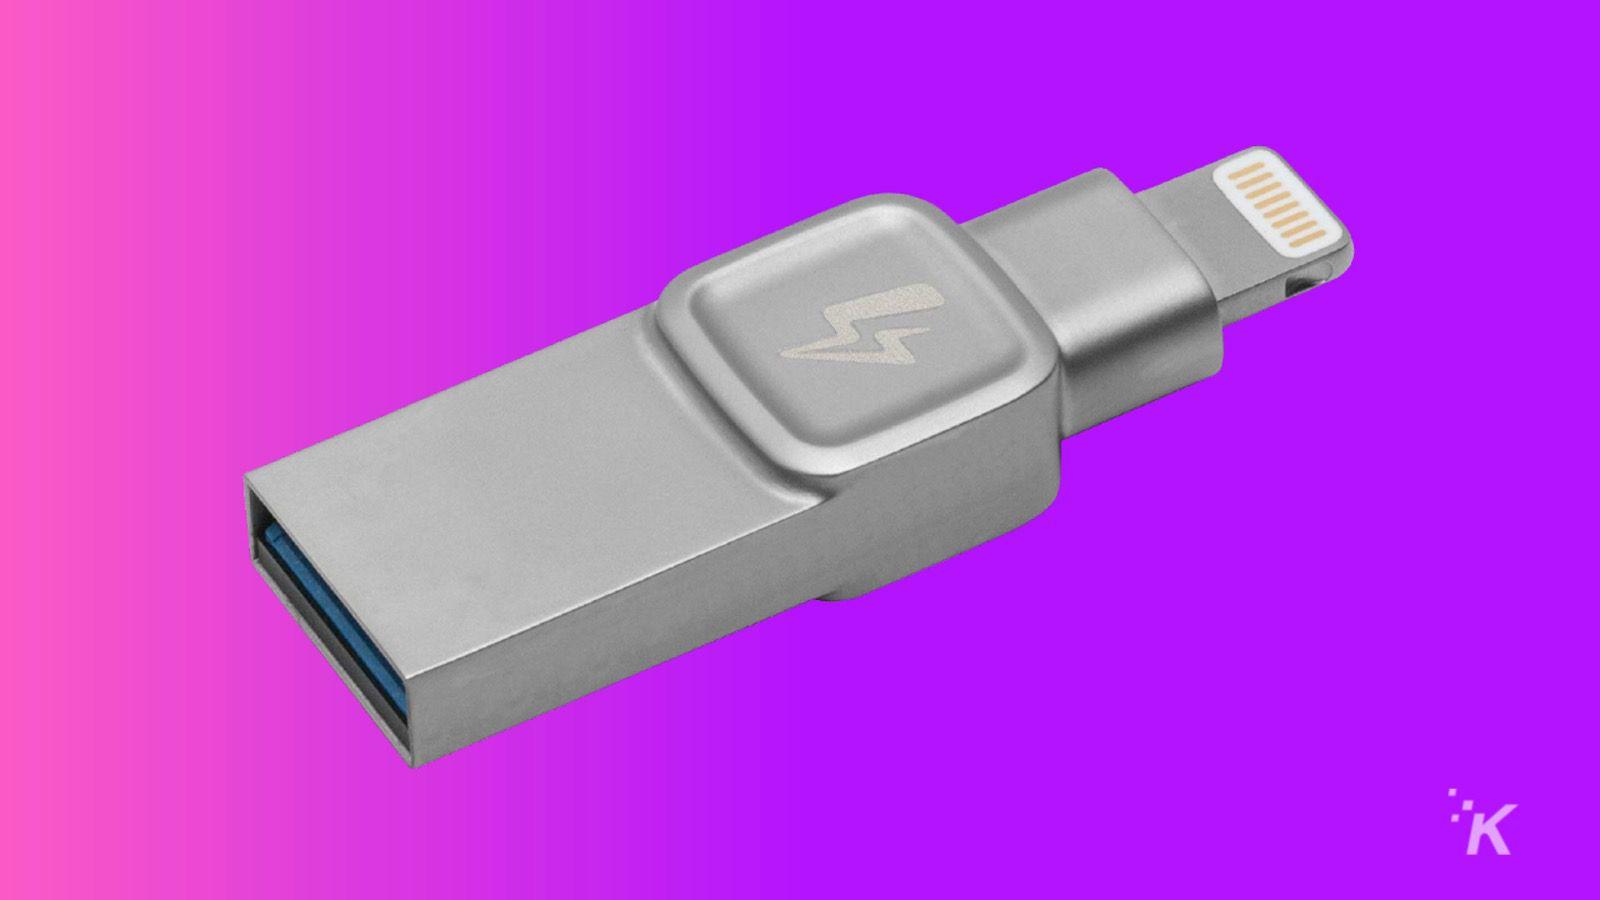 kingston flash drive knowtechie